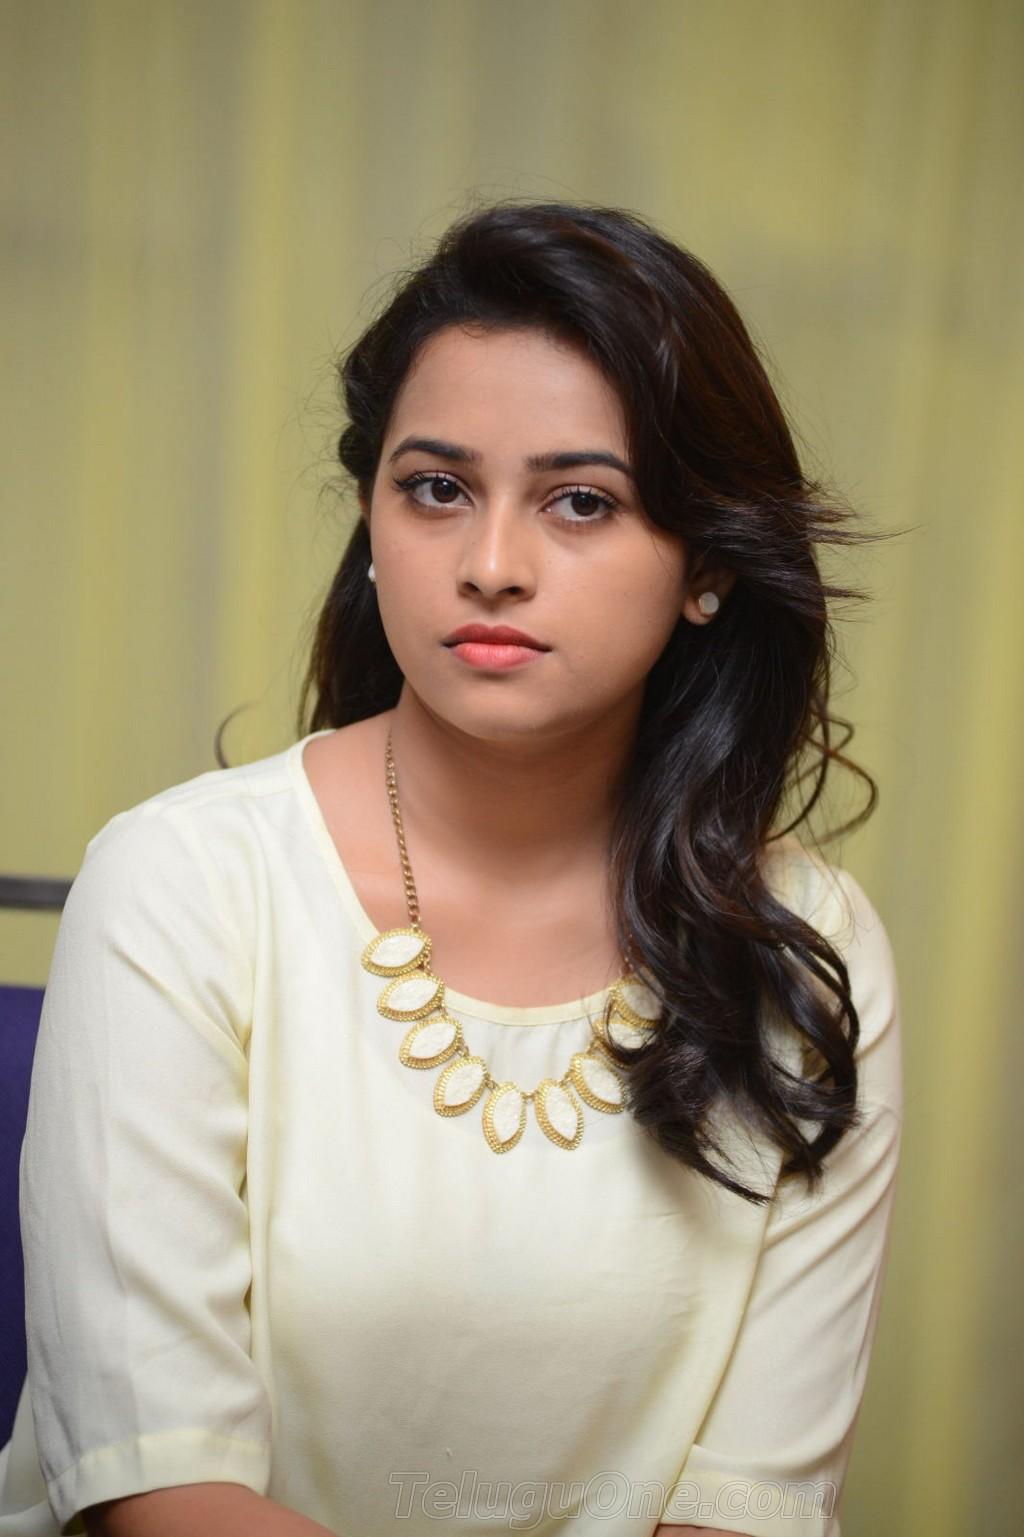 NUDE DESi: DESI TEEN ADE GIRL NUDE PICS - Blogger Tamil singer divya photos